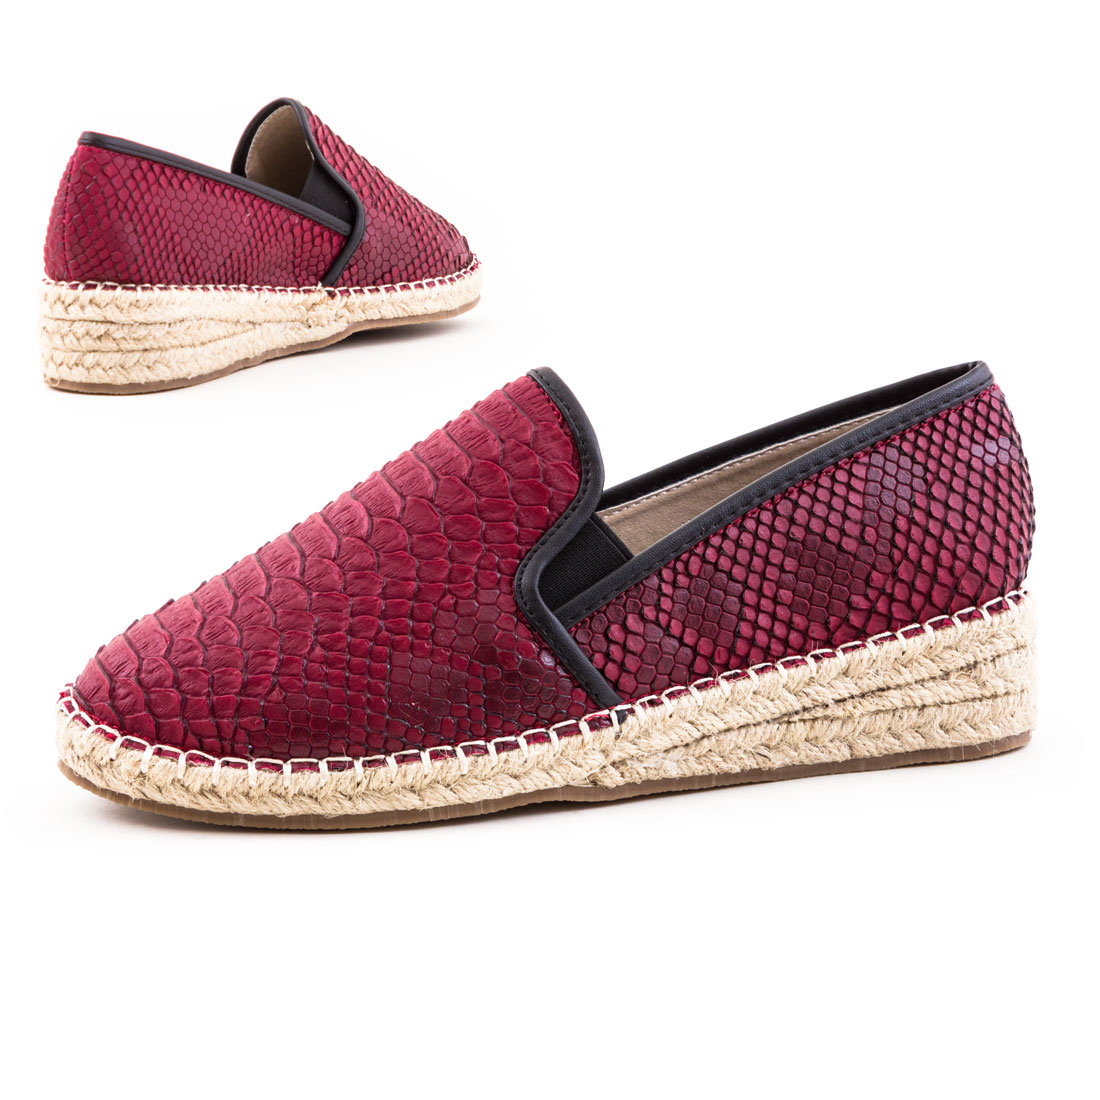 Ziginy Shoes Online